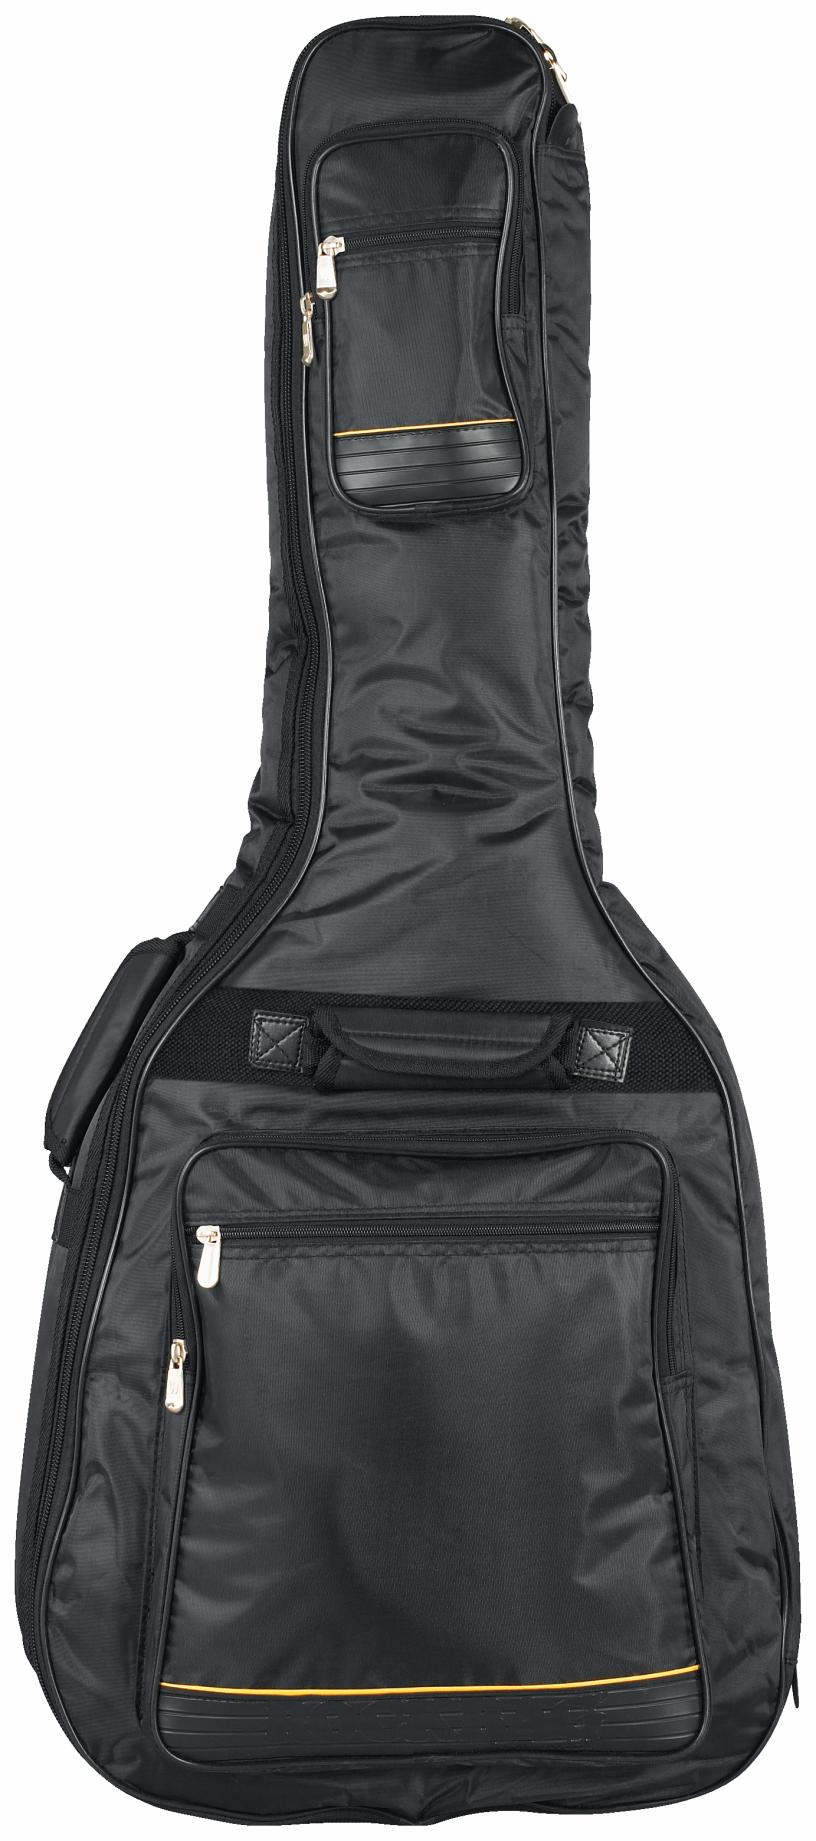 Rockbag RB 20614 B/PLUS